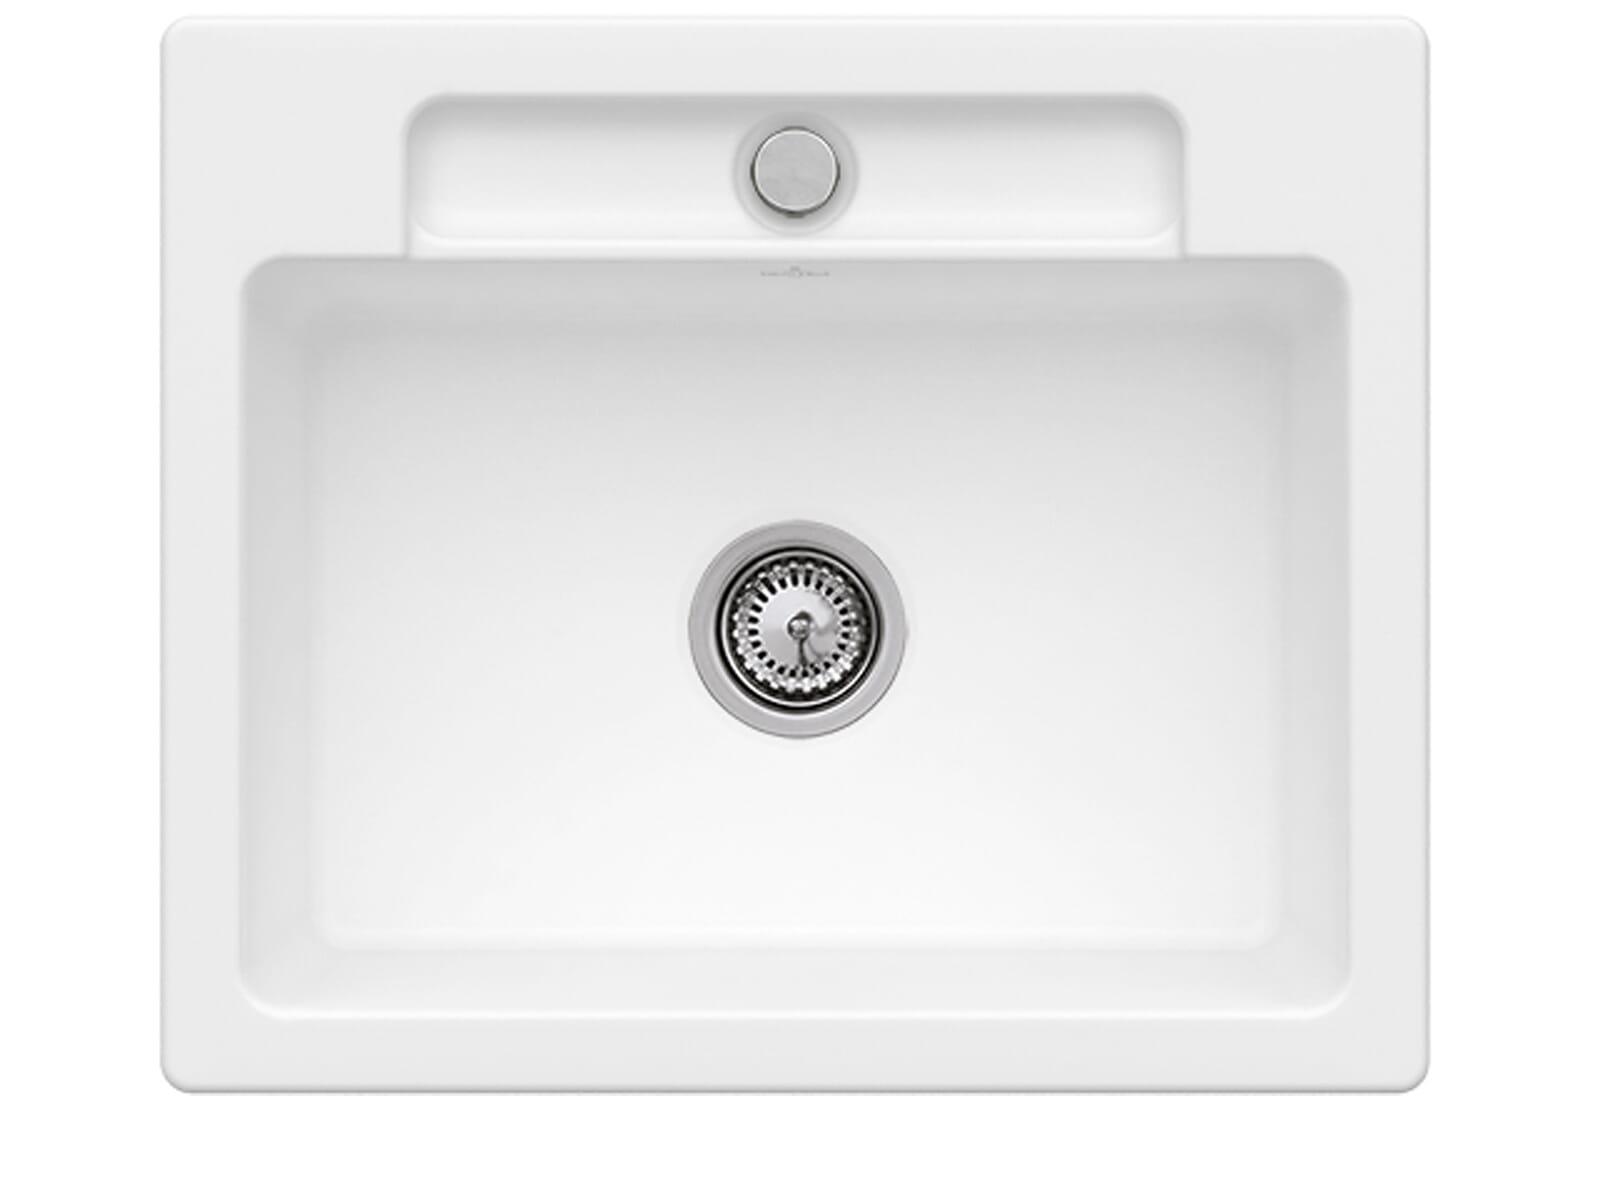 Villeroy & Boch Siluet 60 S Stone White – 3346 01 RW Keramikspüle Handbetätigung